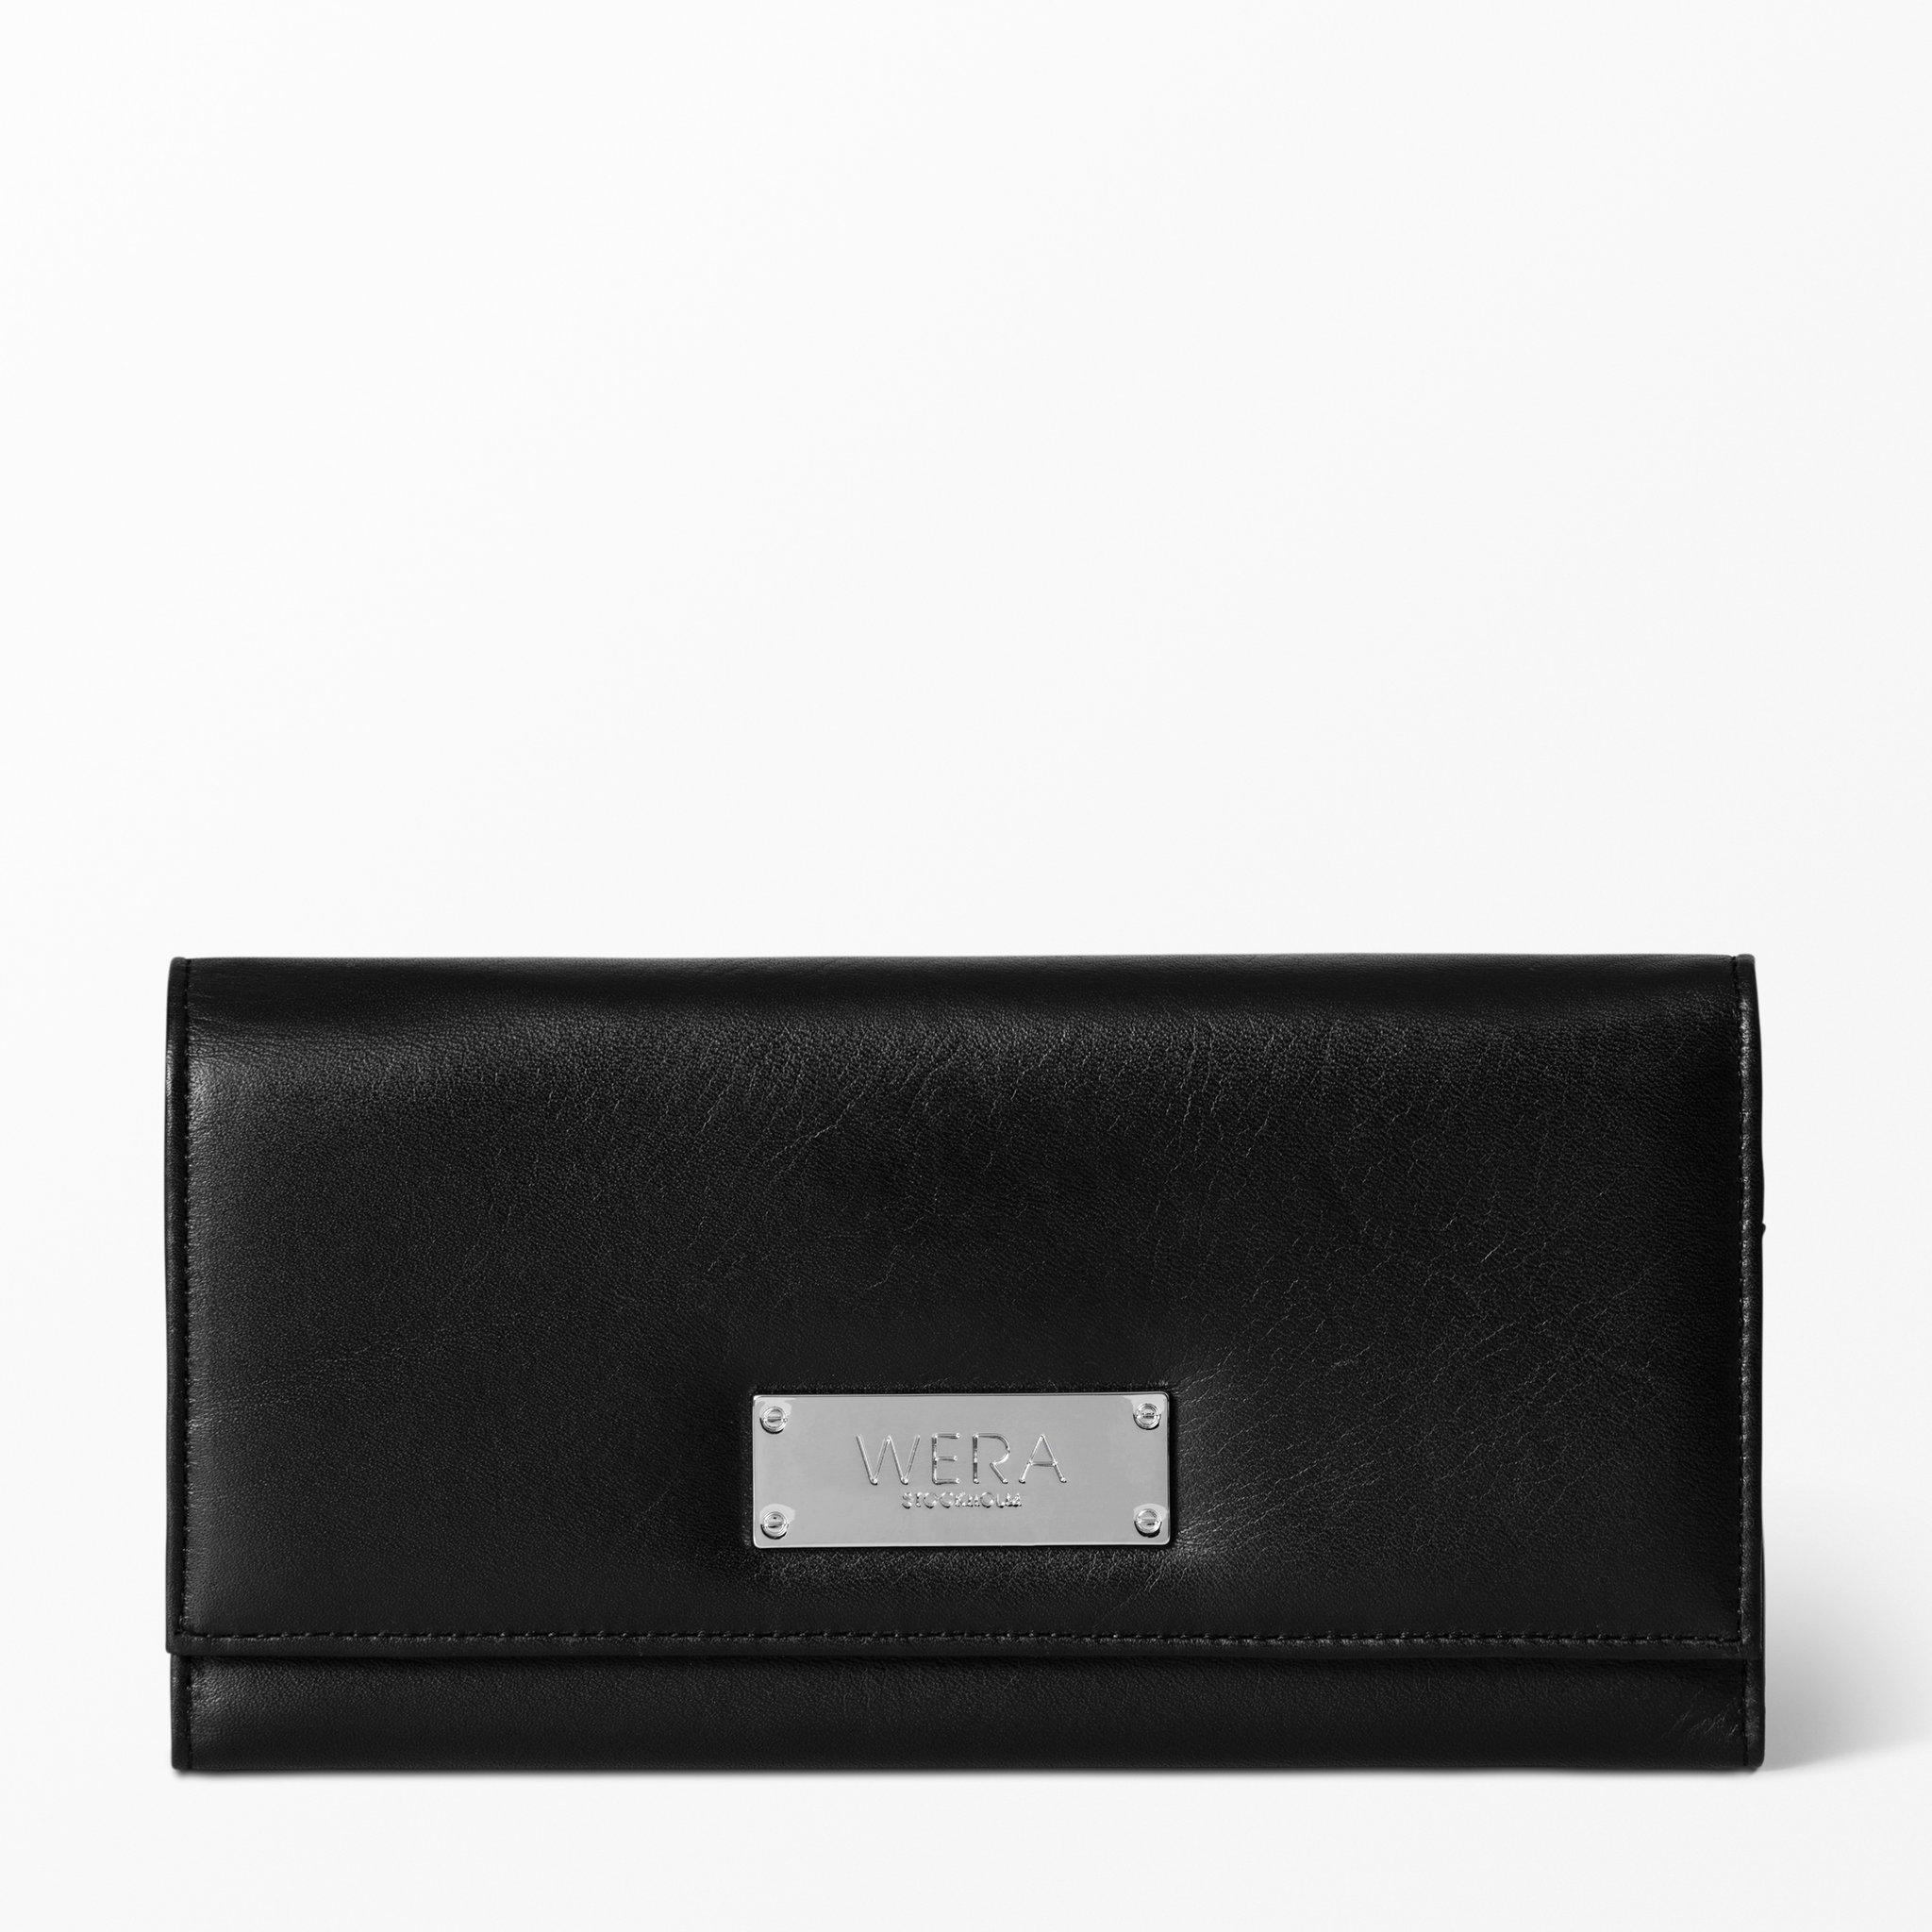 Splitter nya Plånbok i skinn, 19x10x2 cm - Plånböcker & fodral - Köp online på GH-31